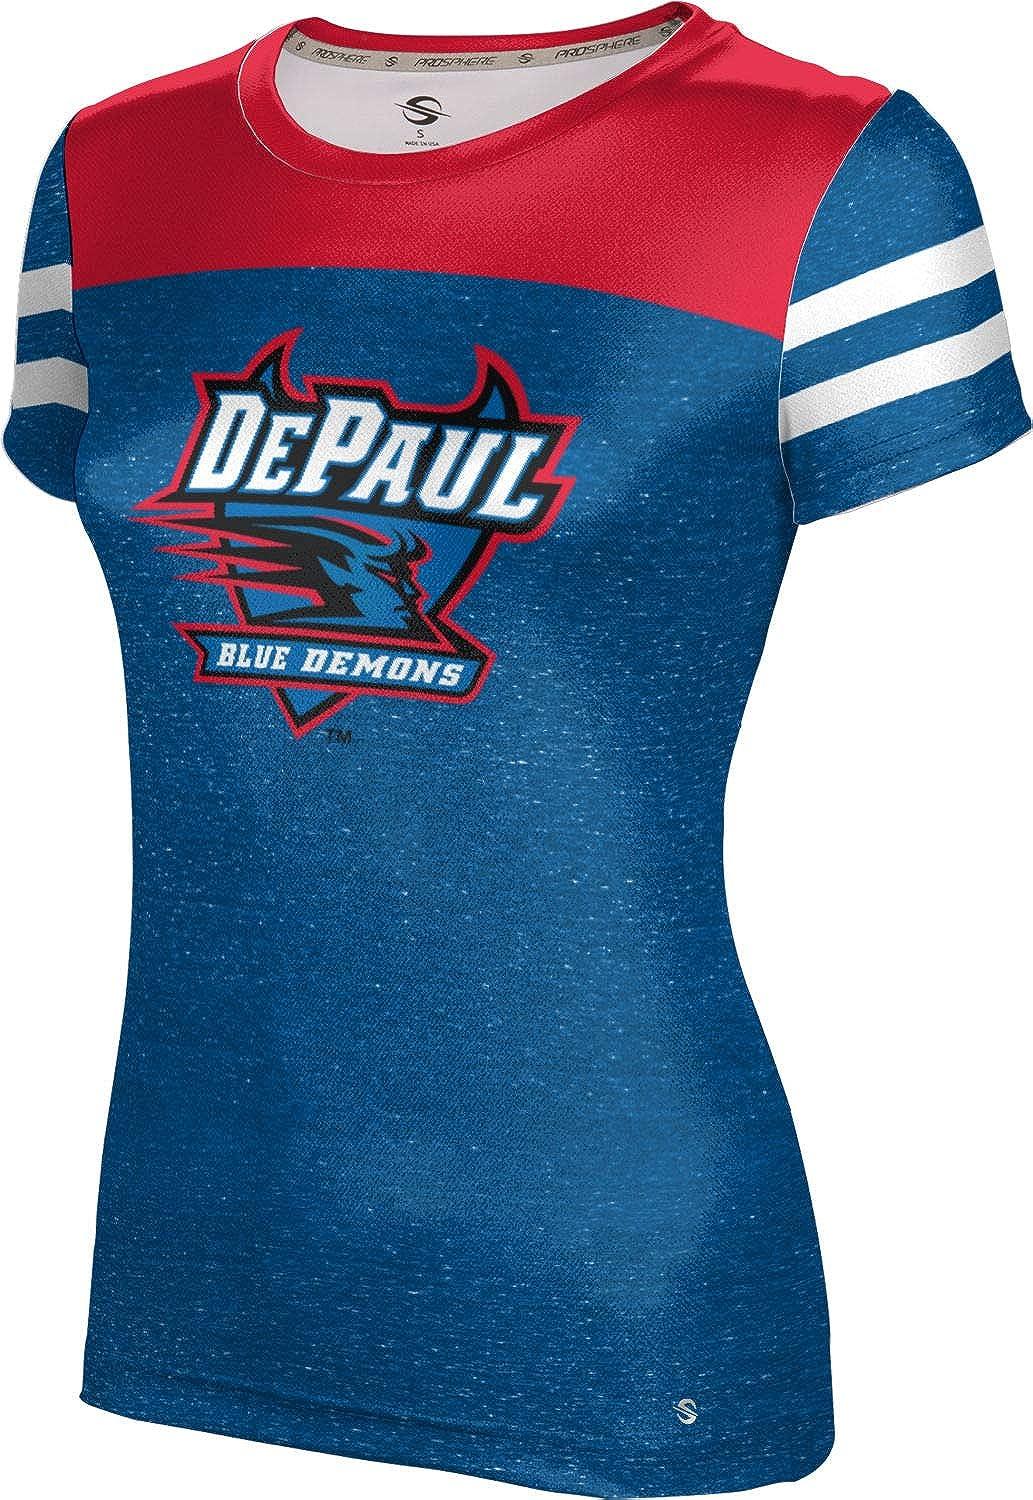 ProSphere DePaul University Girls' Performance T-Shirt (Gameday)